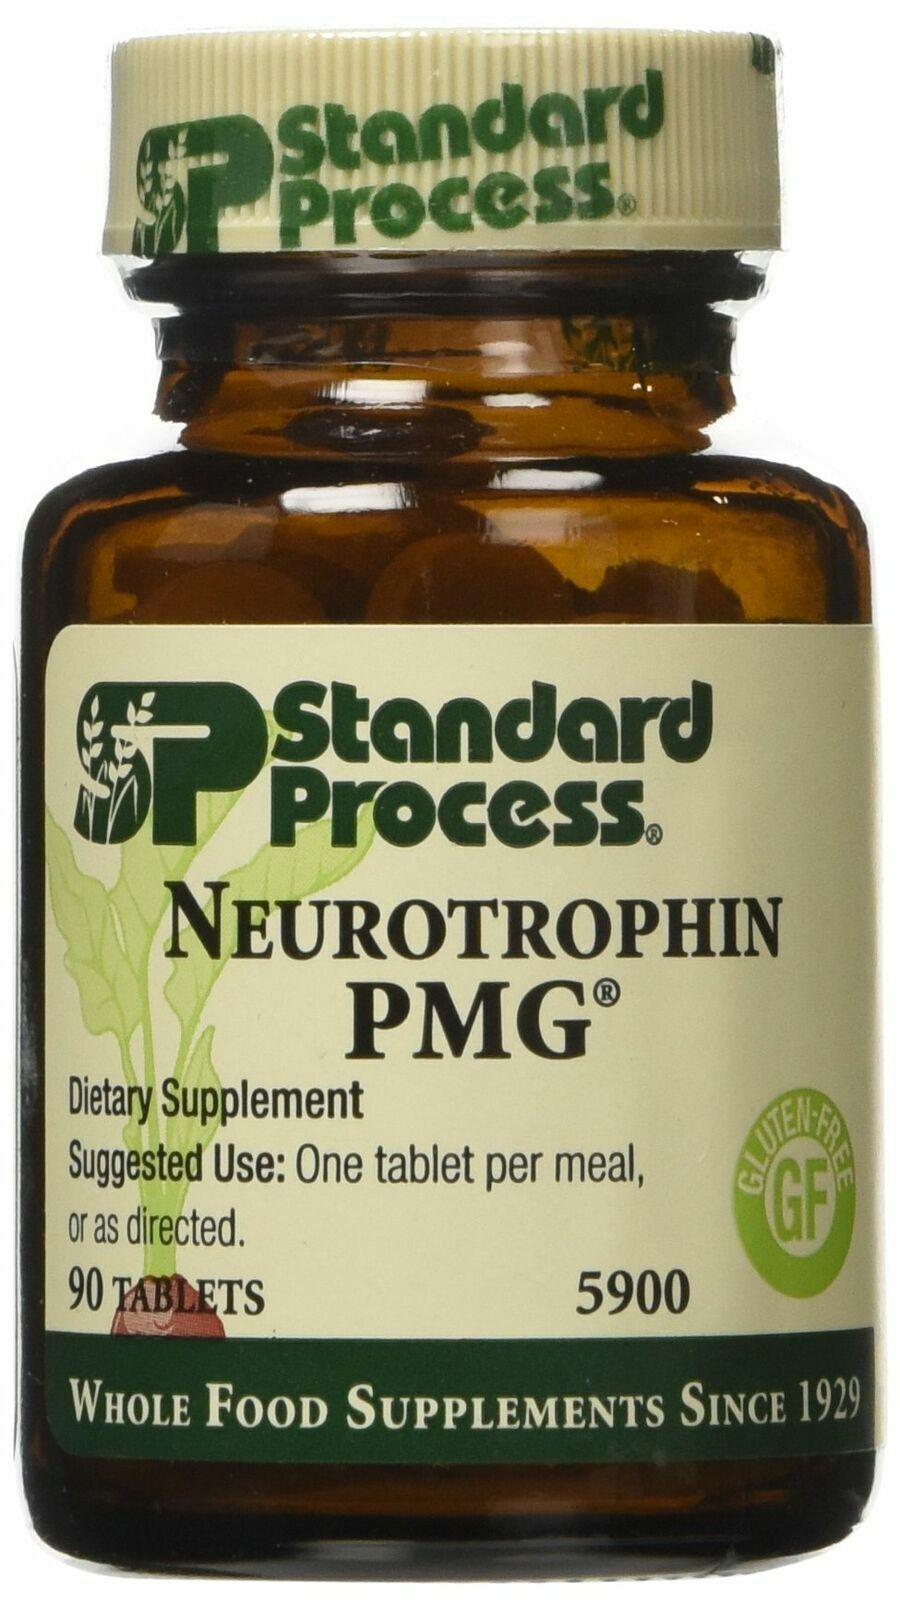 Standard Process | Neurotrophin PMG | 90 Tablets